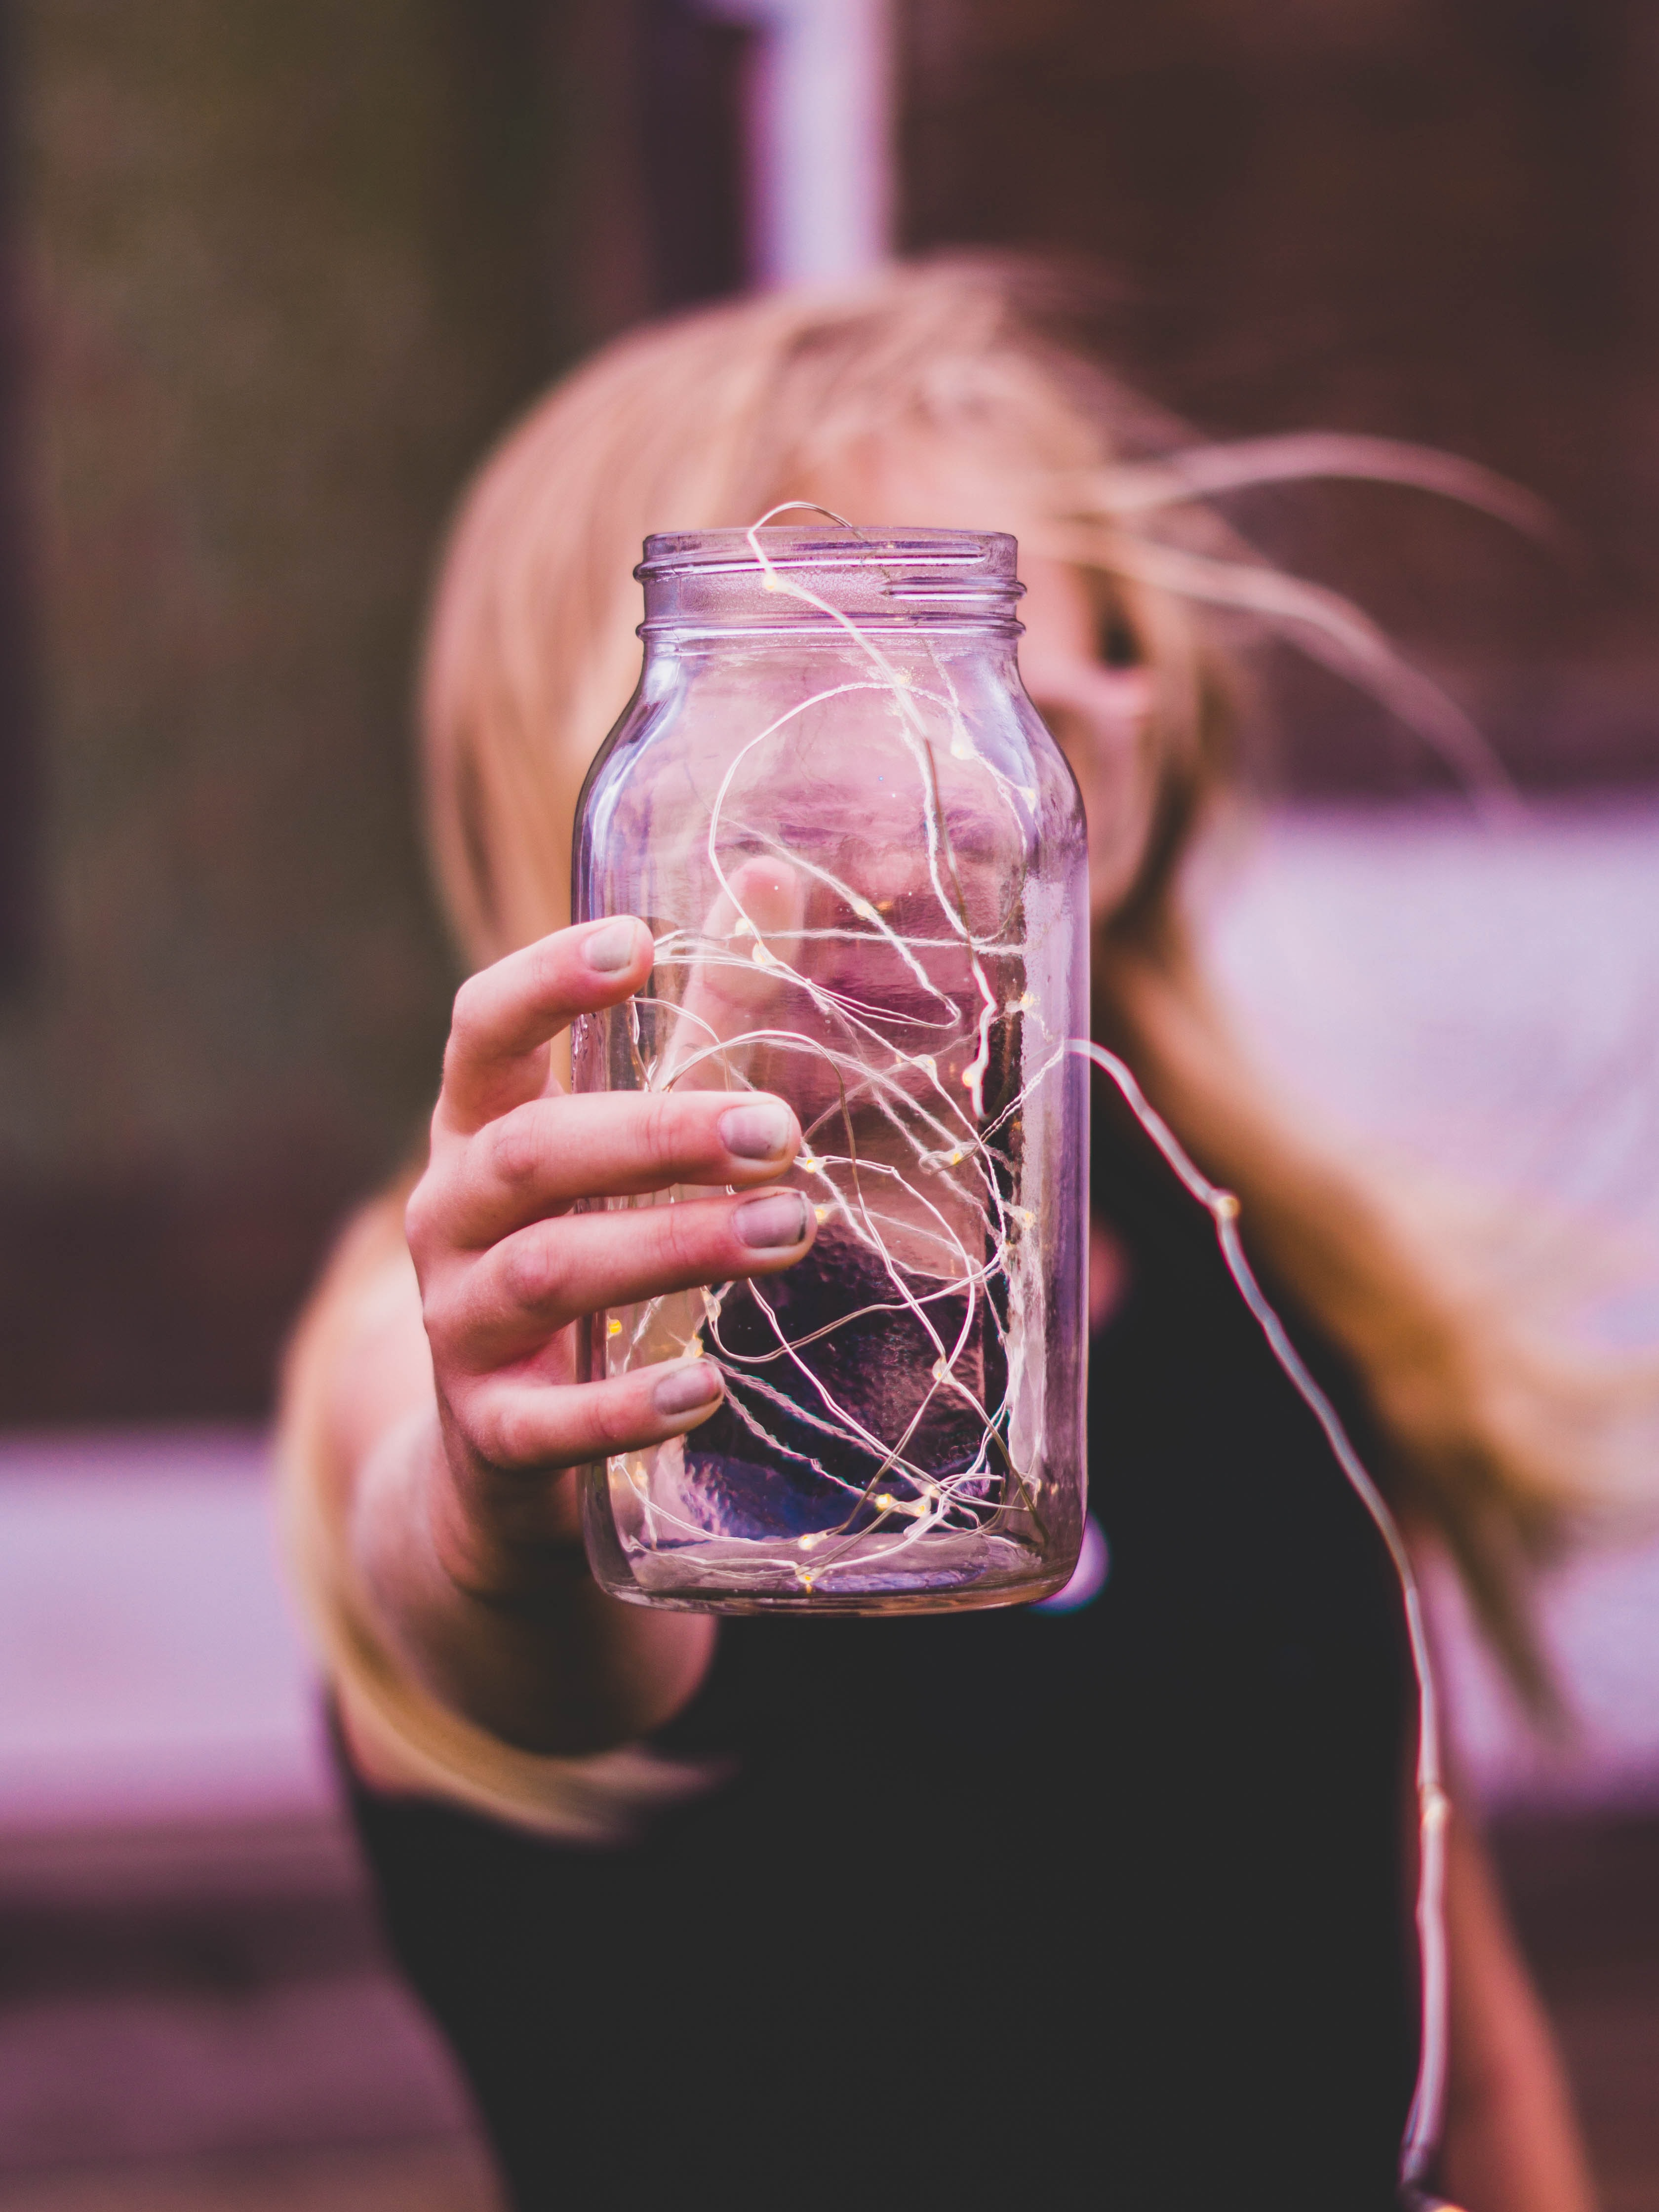 selective focus photography of glass jar